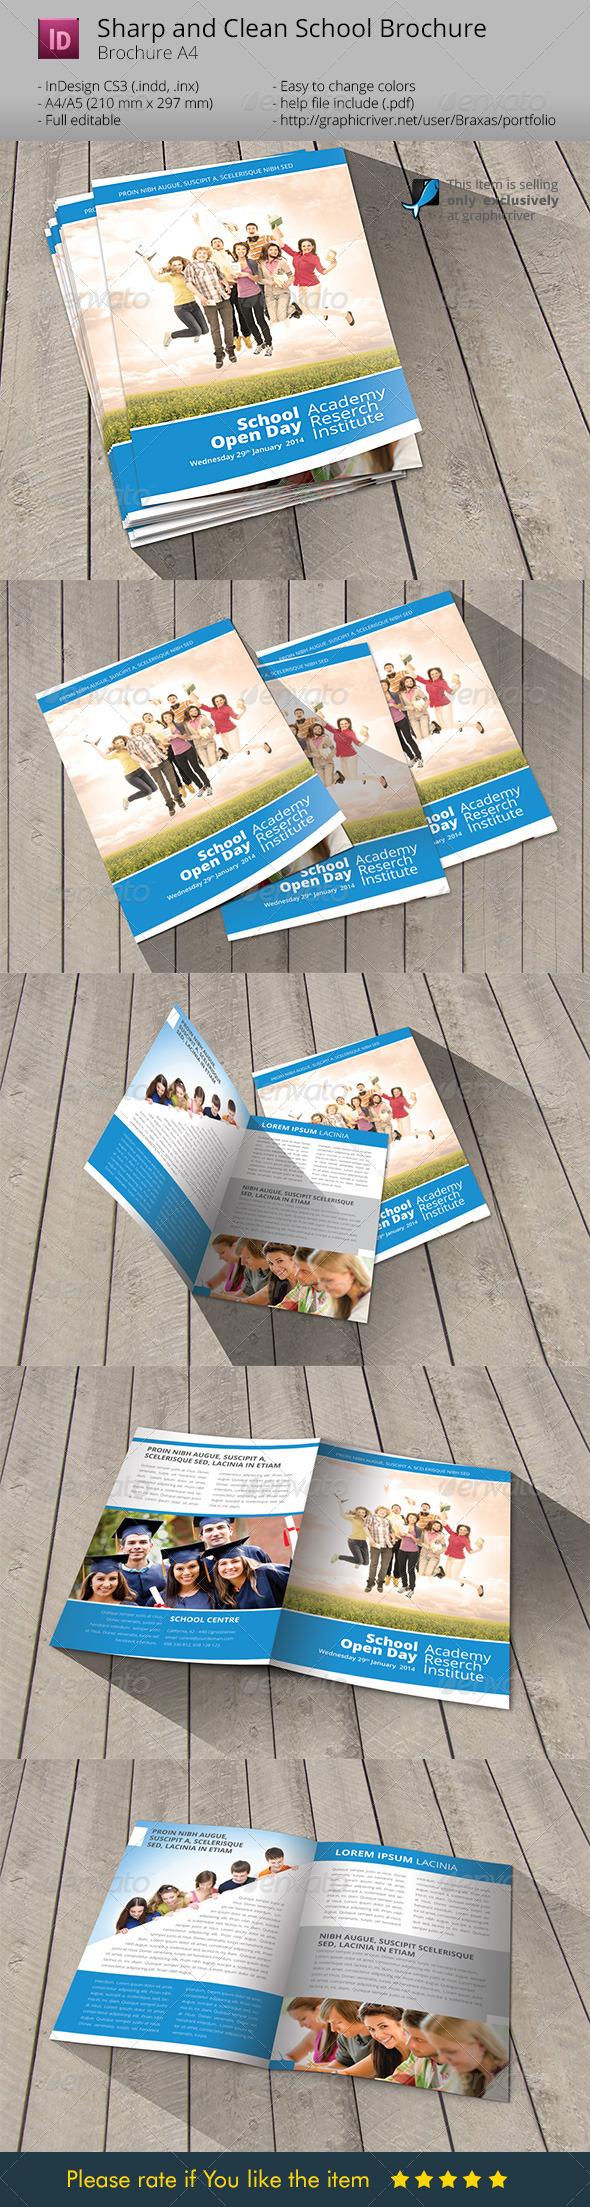 School Welcome Brochure Template By Braxas GraphicRiver - Welcome brochure template